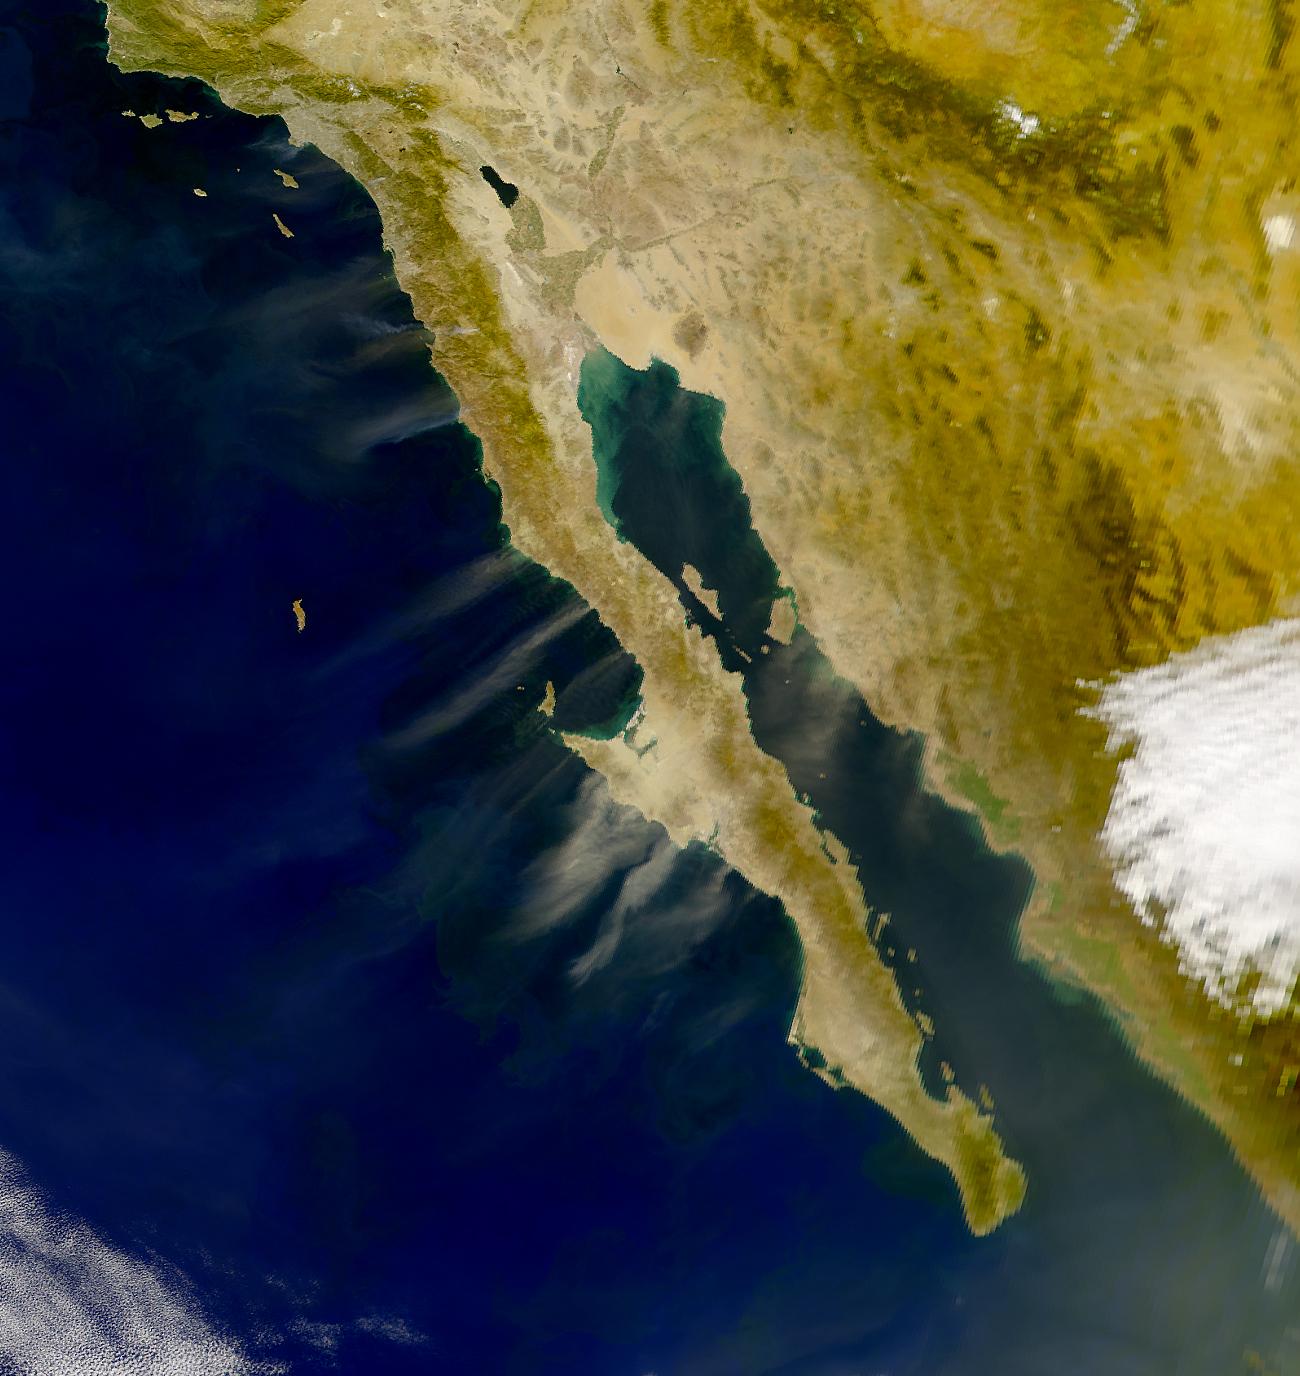 Penachos encima de Baja California, México